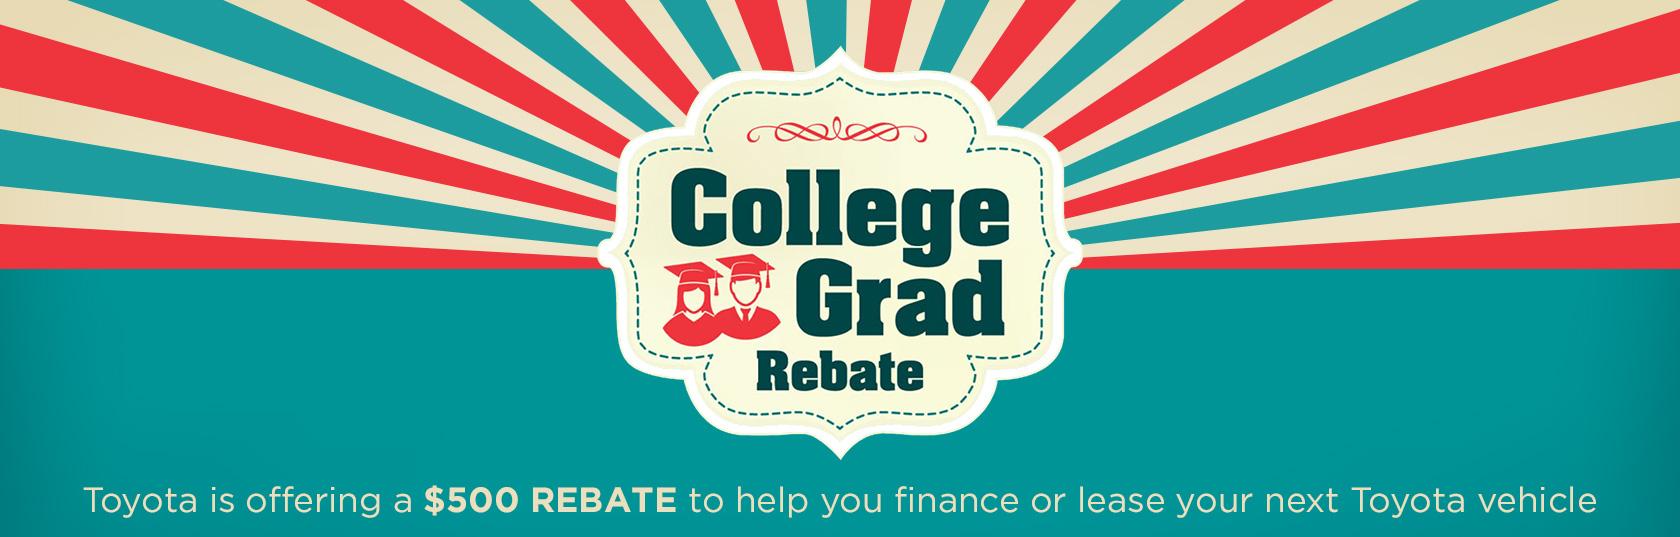 College Grad Rebate Banner